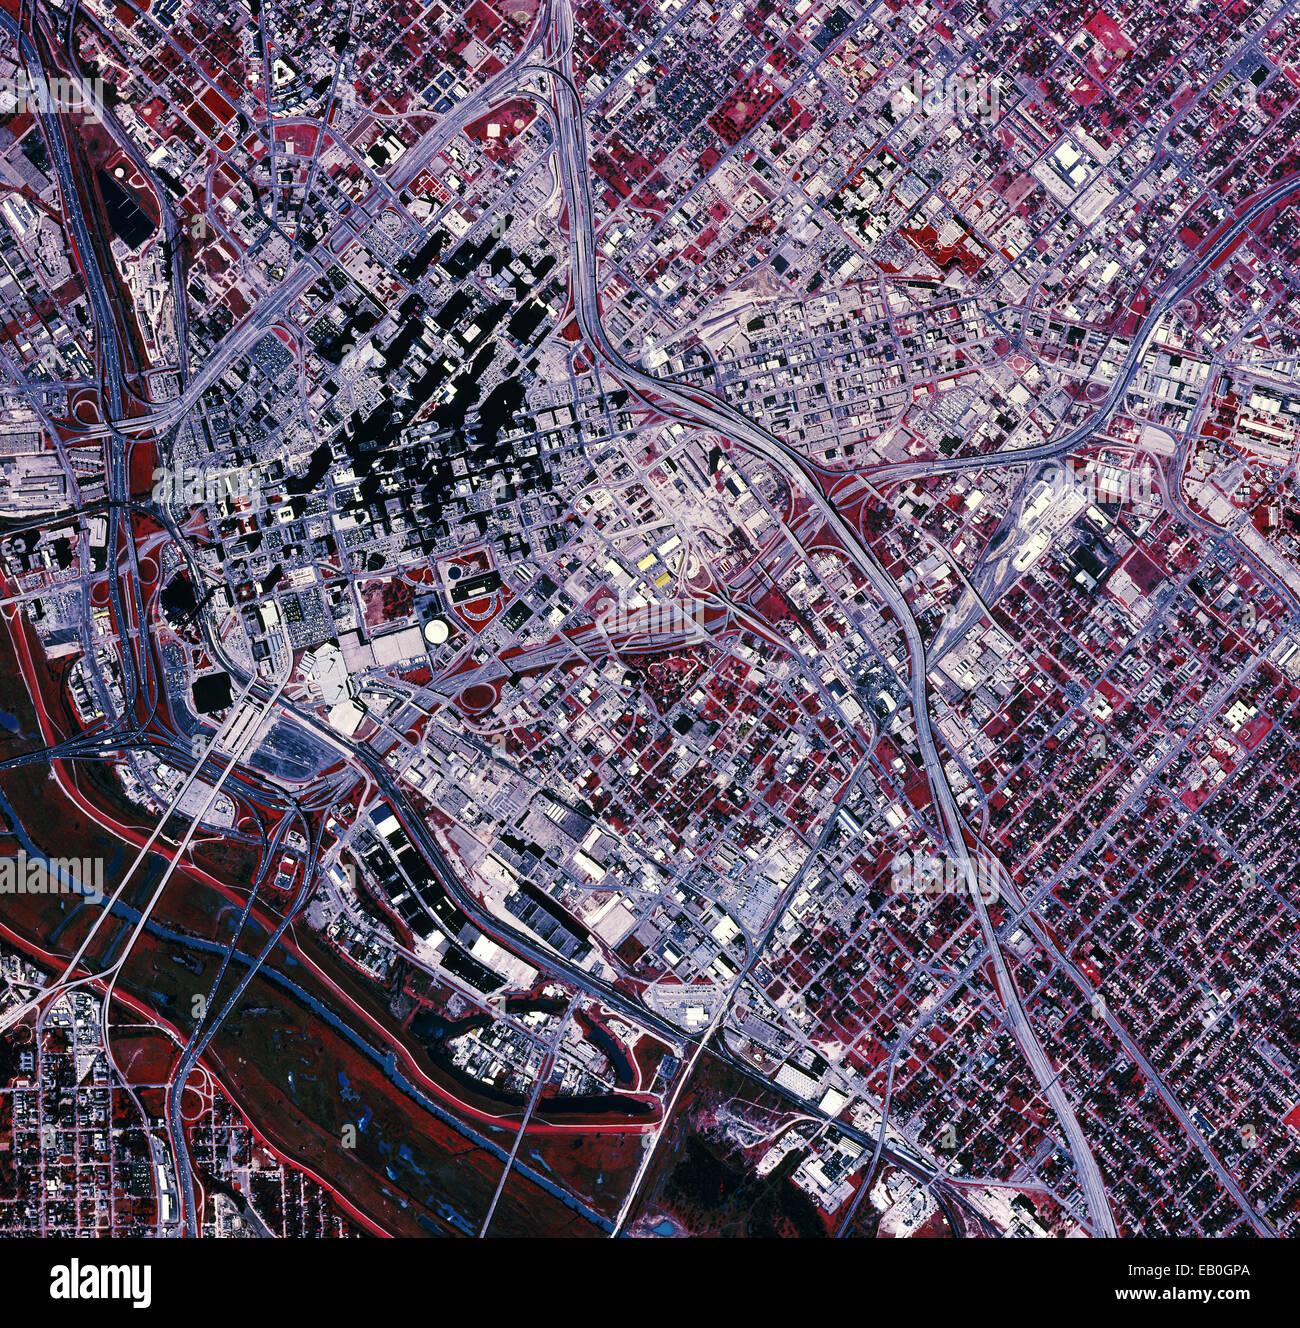 color infrared aerial photograph Dallas, Texas, 1995 - Stock Image